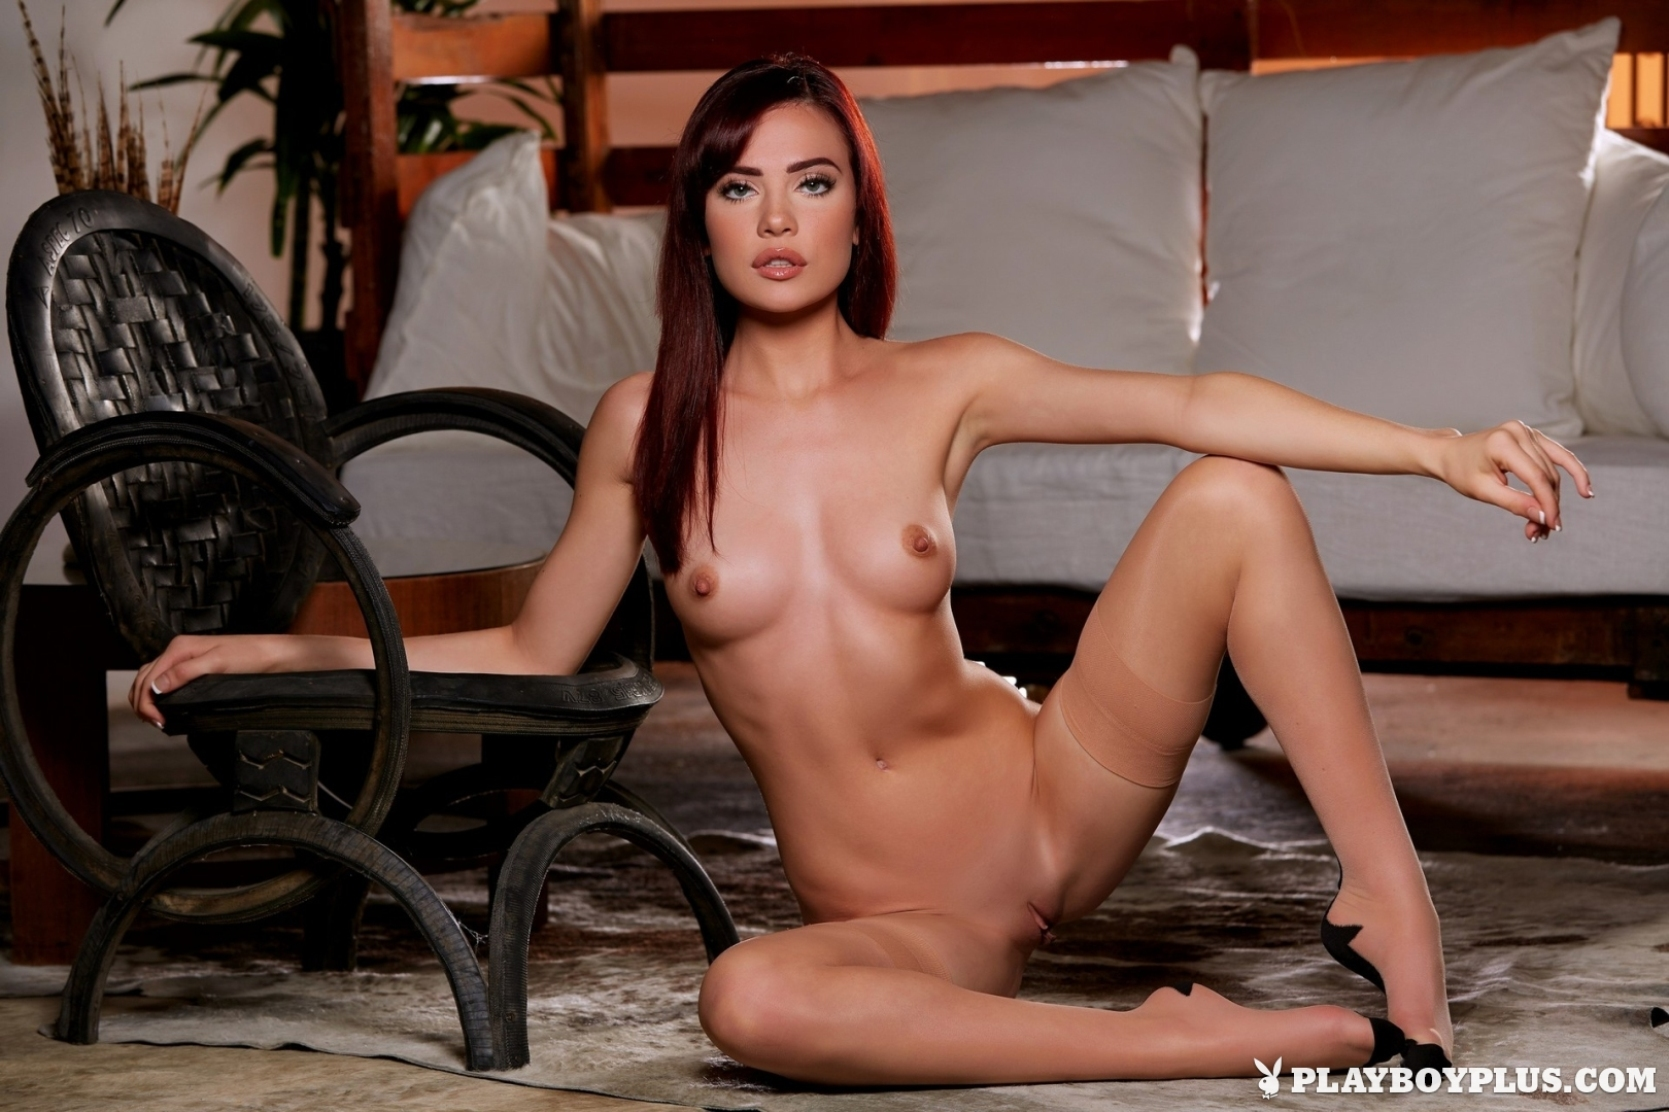 Playboy Plus | Sabina Rouge in Little Bit of Lust 12